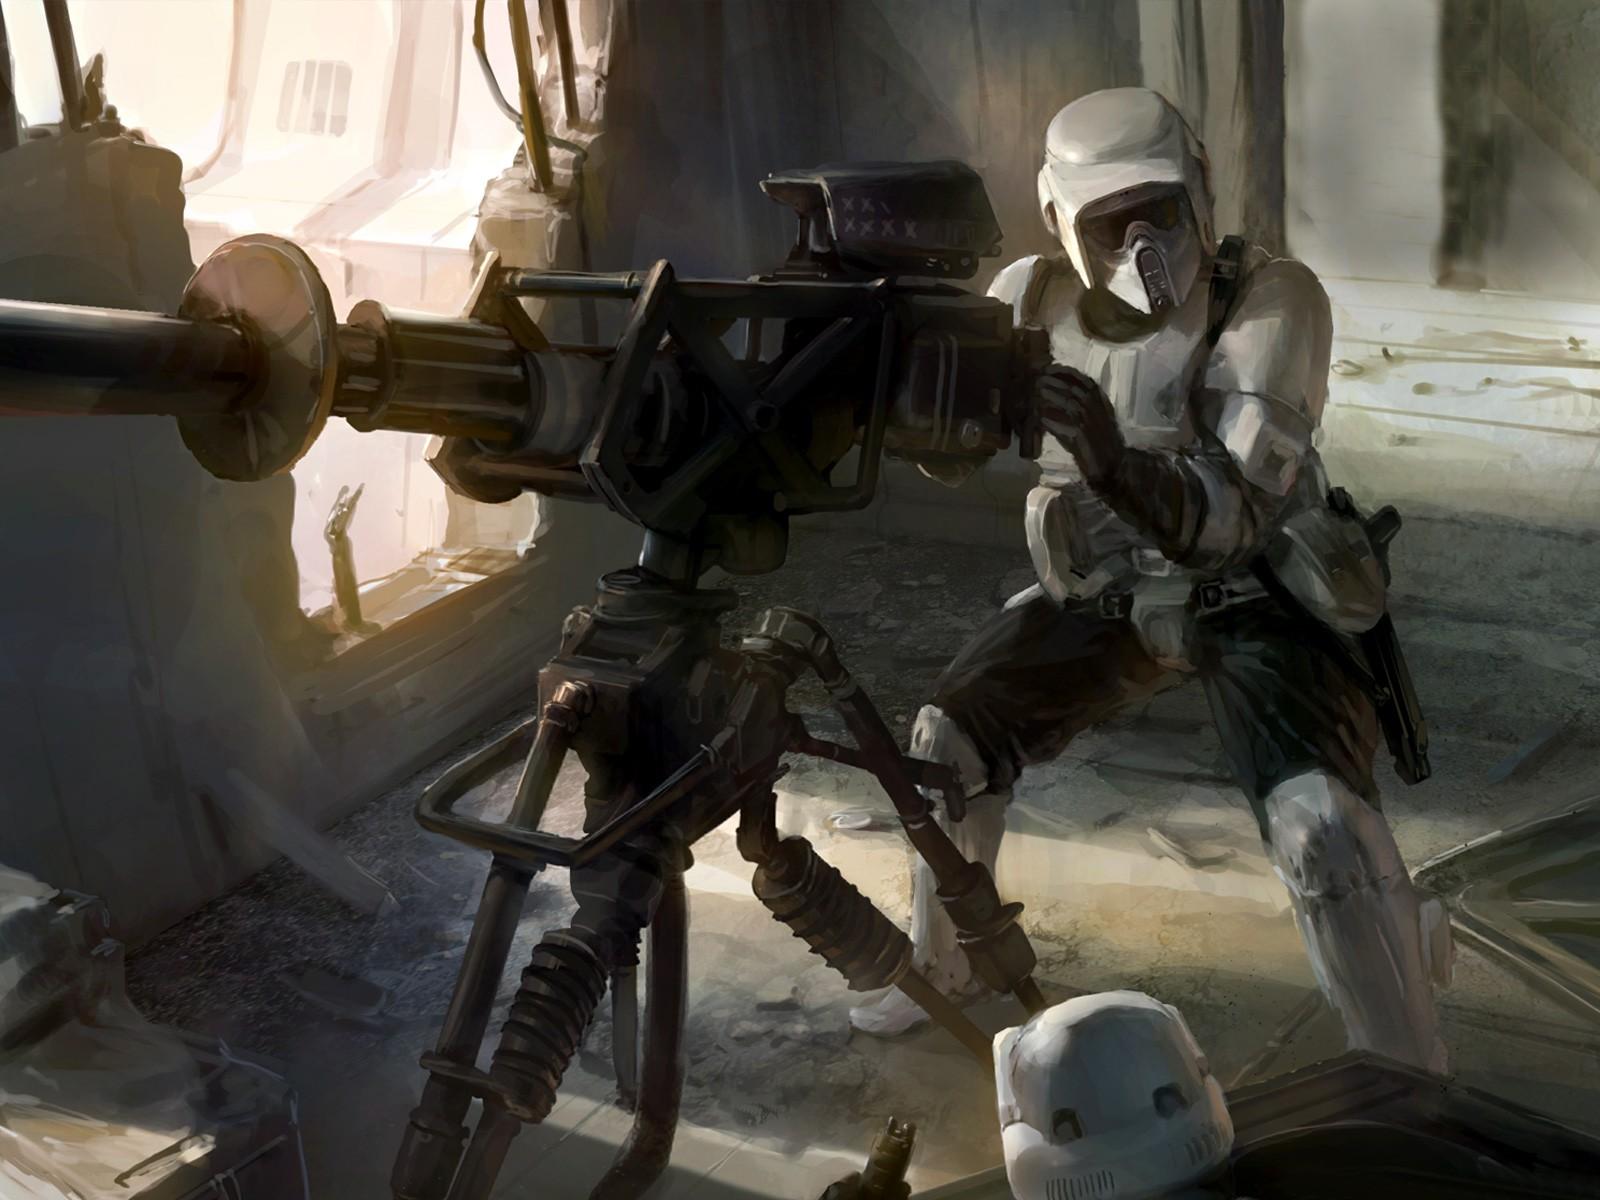 Wallpaper Star Wars Scout Trooper Art 1678970 Hd Wallpaper Backgrounds Download